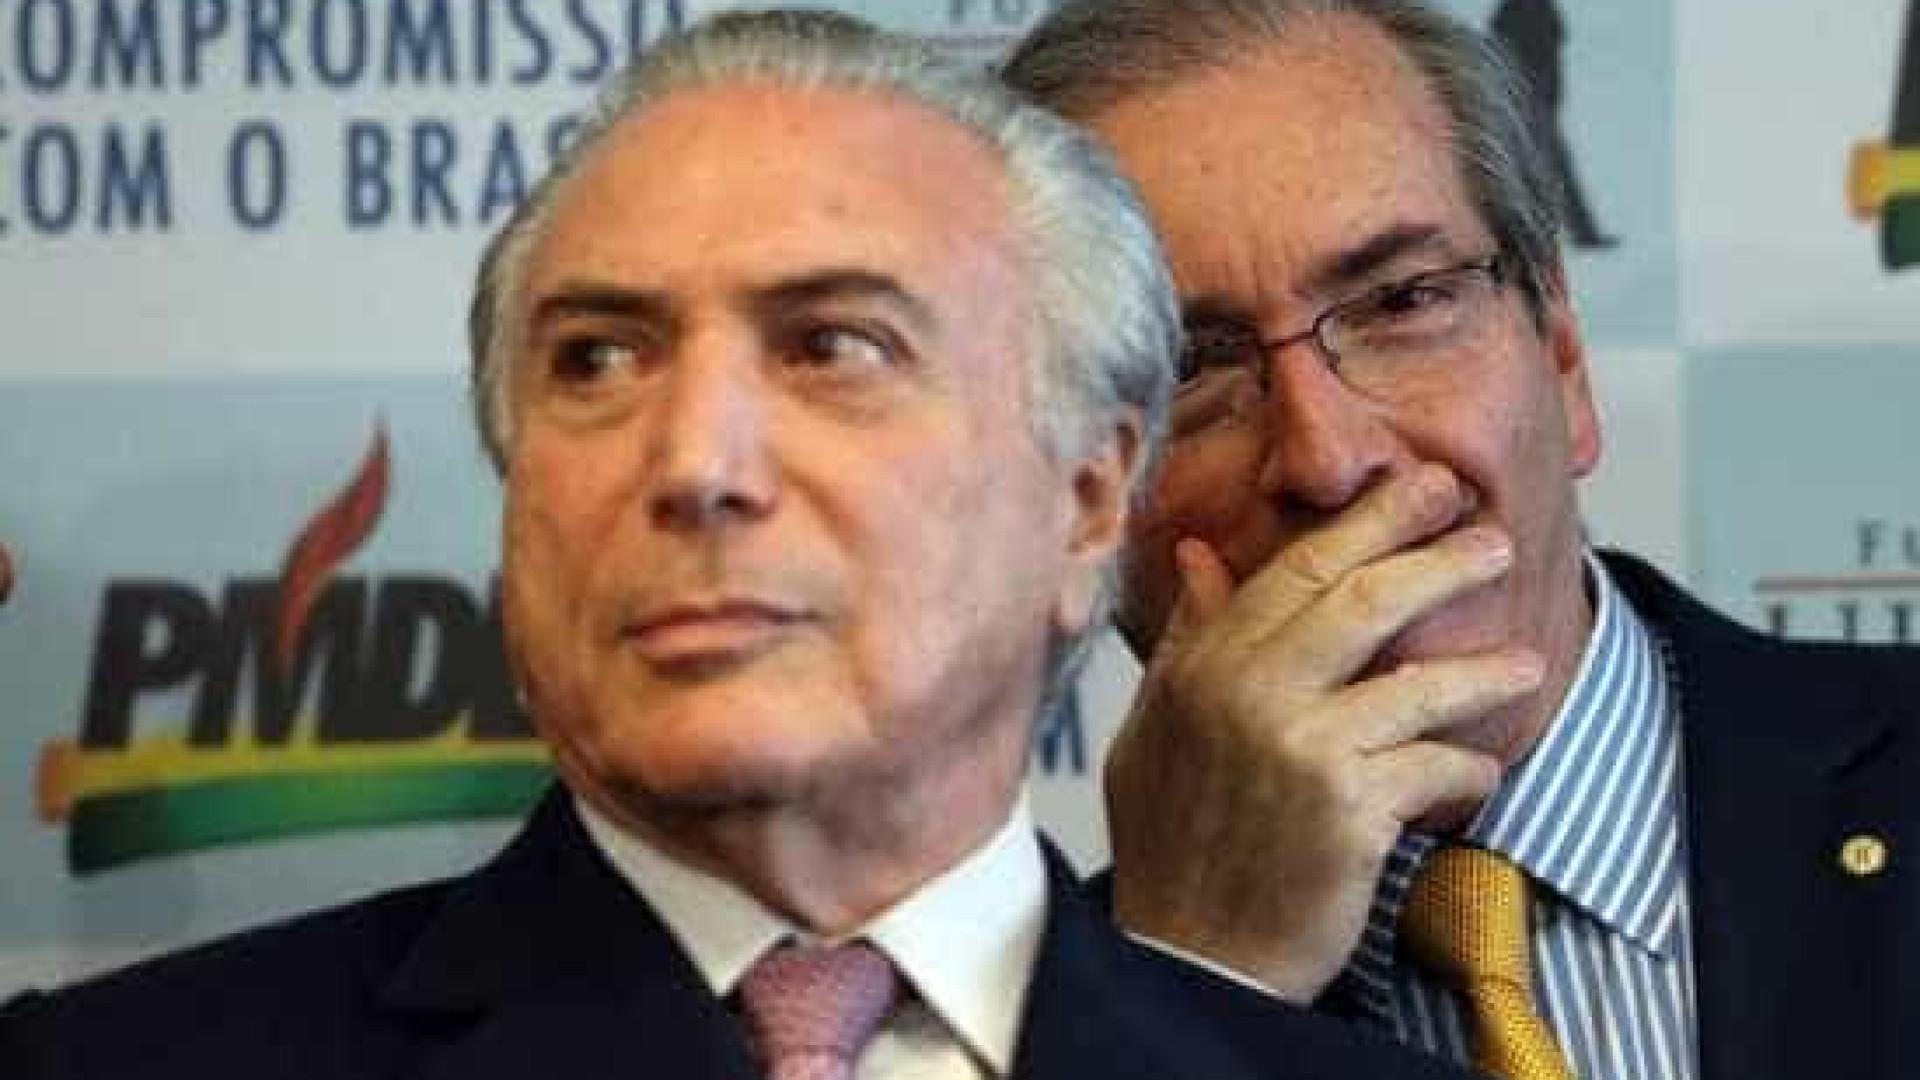 Na Justiça, Cunha questiona Temer  sobre vantagem a Moreira